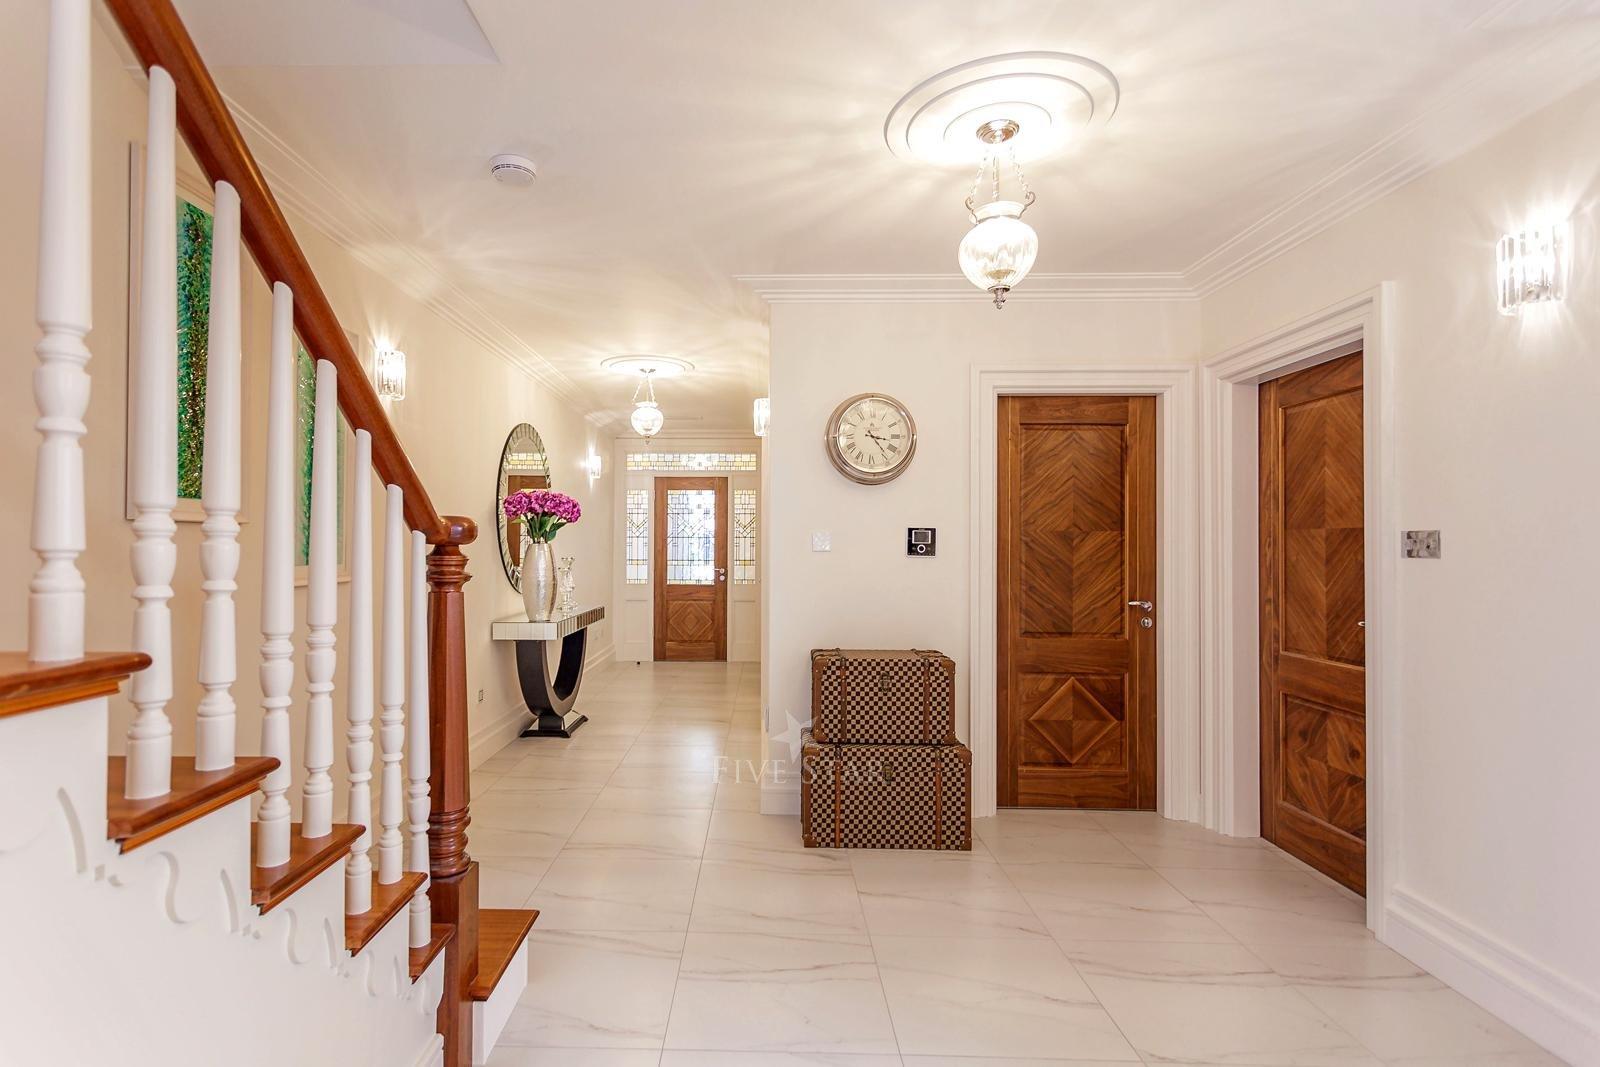 5-Star Killarney Residence photo 20